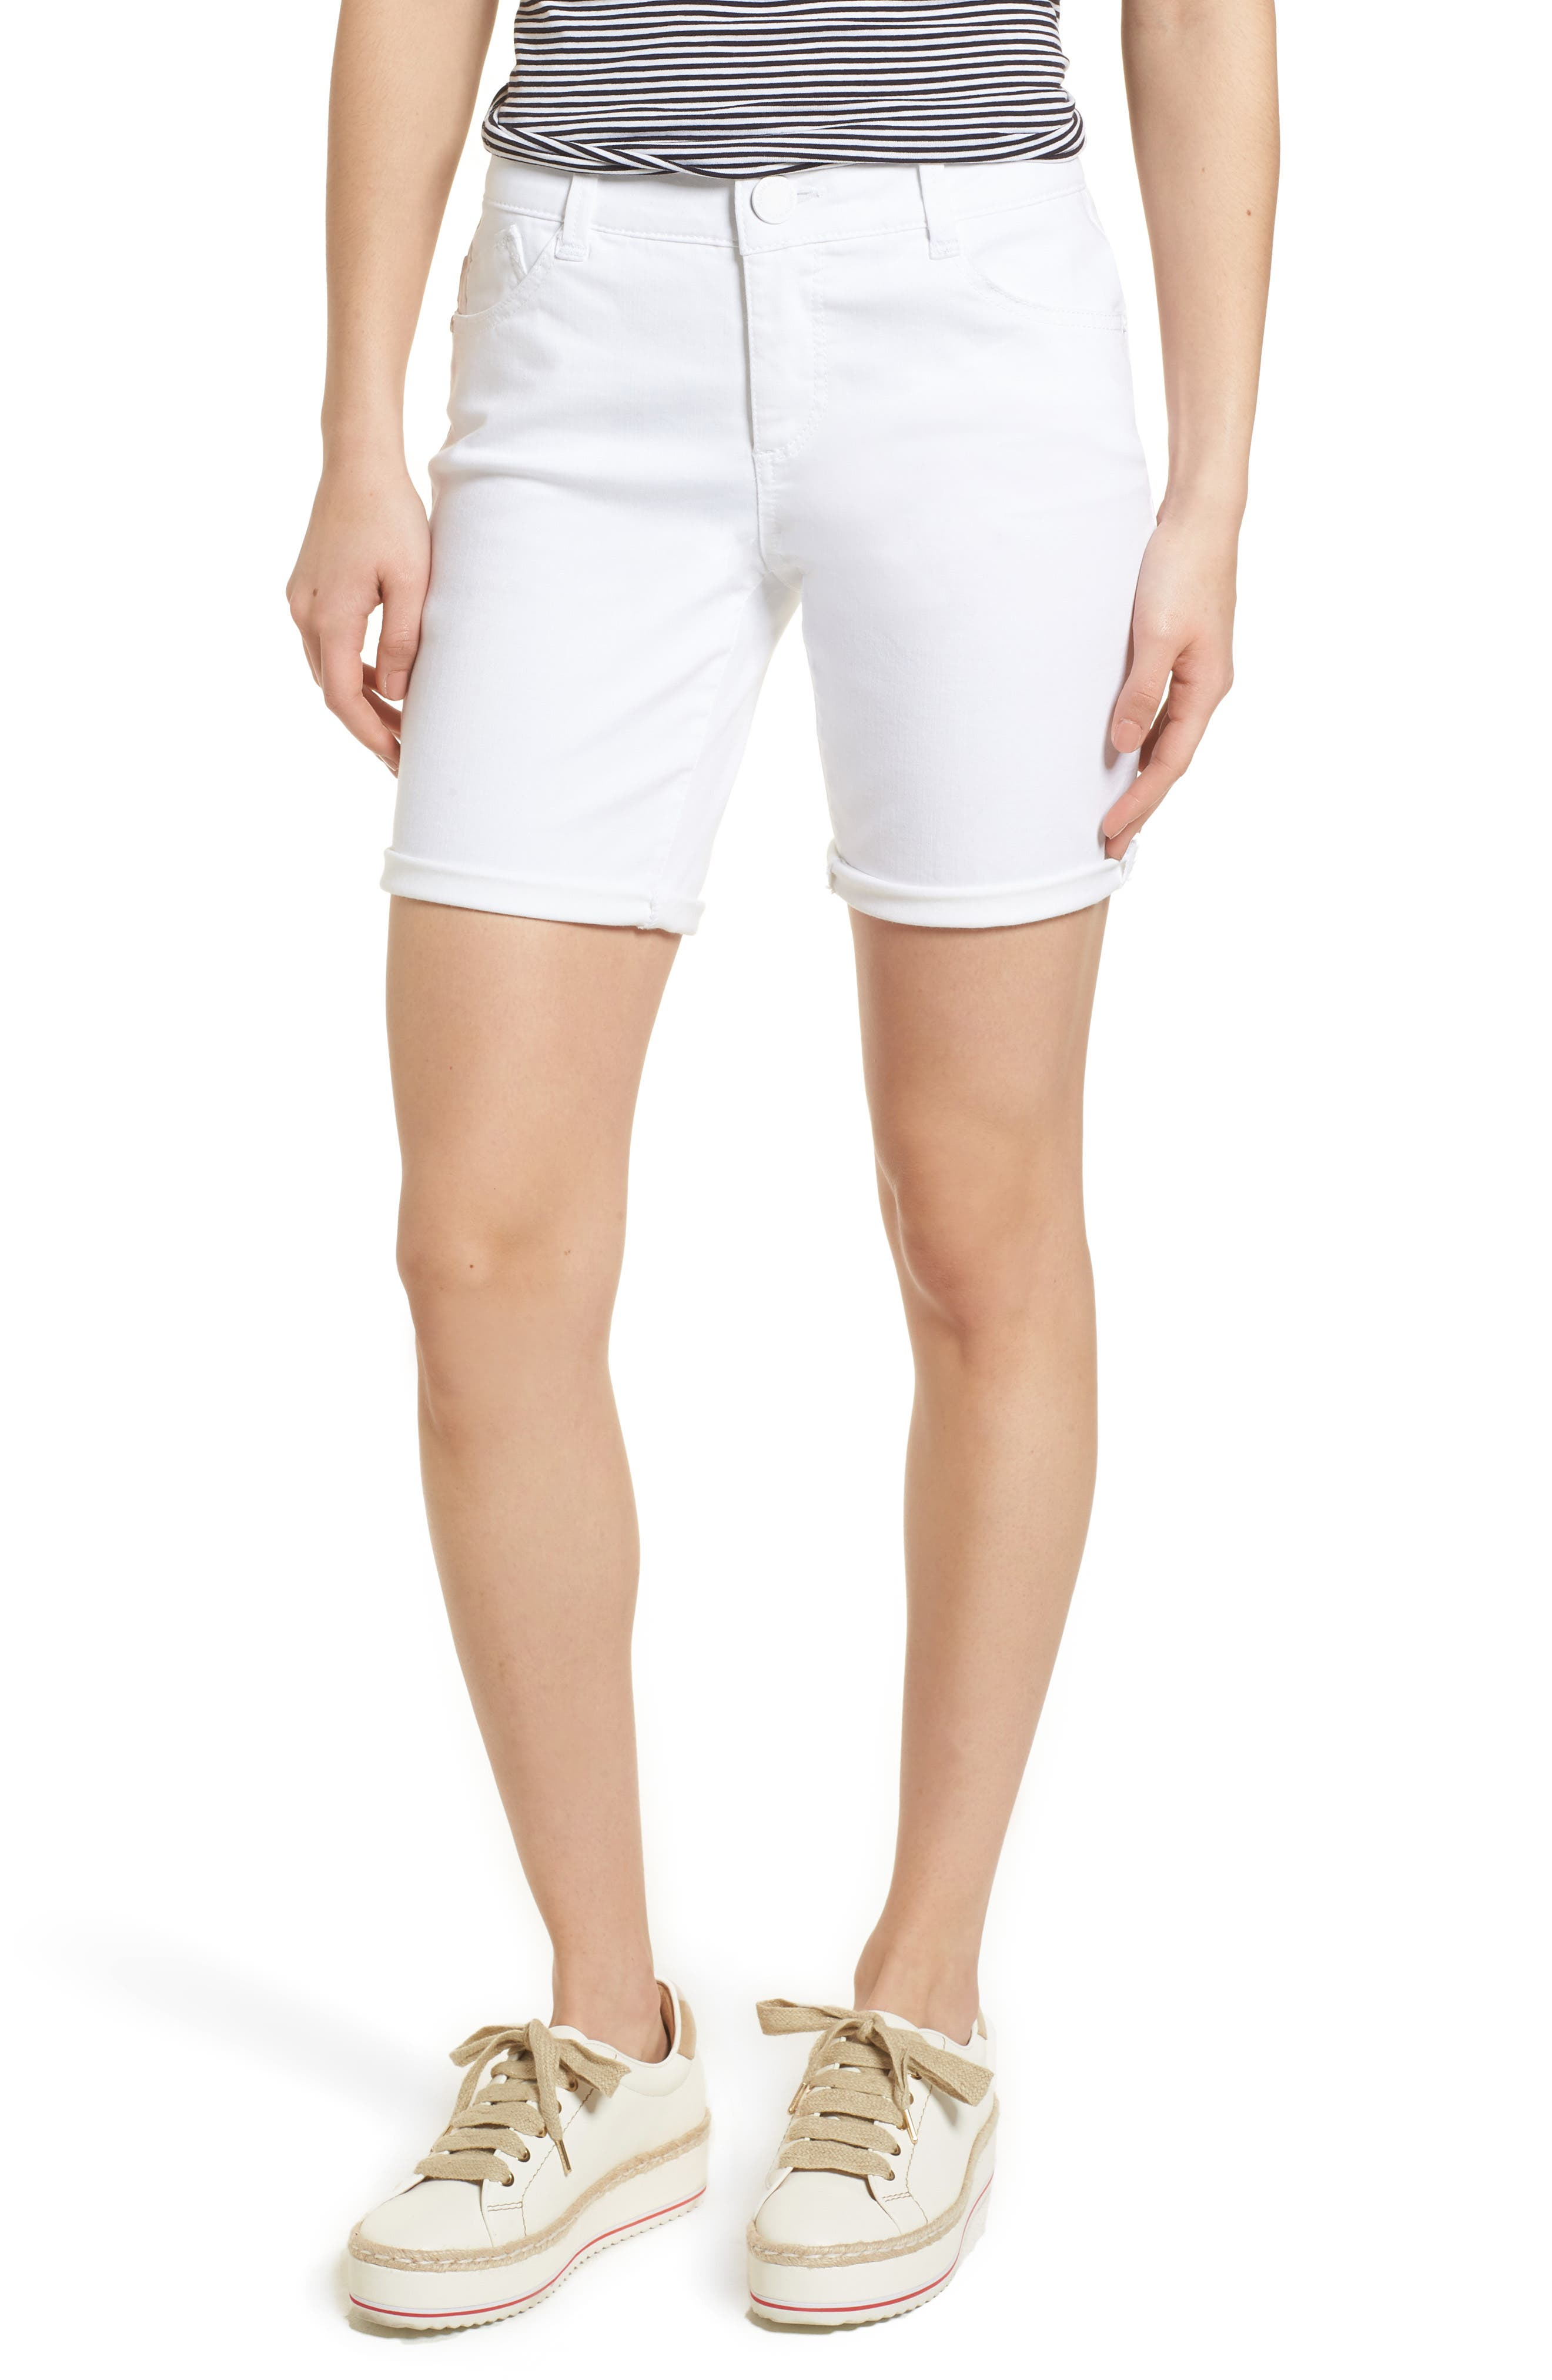 Wit & Wisdom Ab-Solution White Denim Shorts (Regular & Petite) (Nordstrom Exclusive)